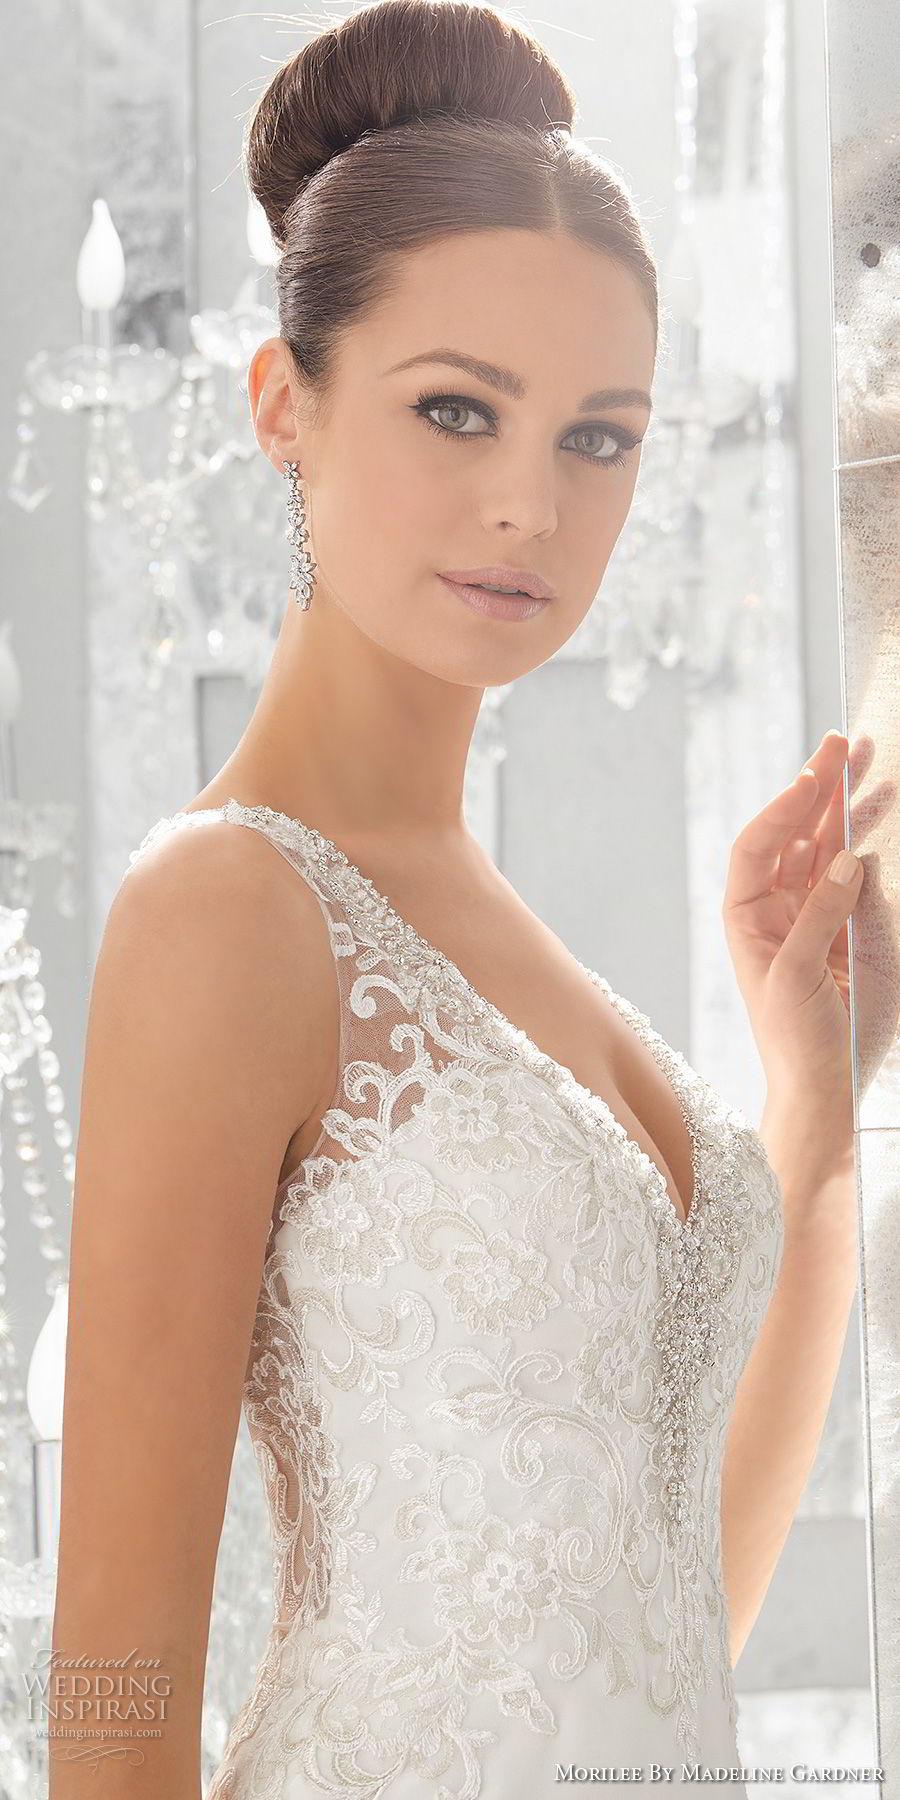 morilee fall 2017 blu bridal sleeveless strap v neck heavily embellished bodice elegant sheath wedding dress button lace back short train (64) zsdv